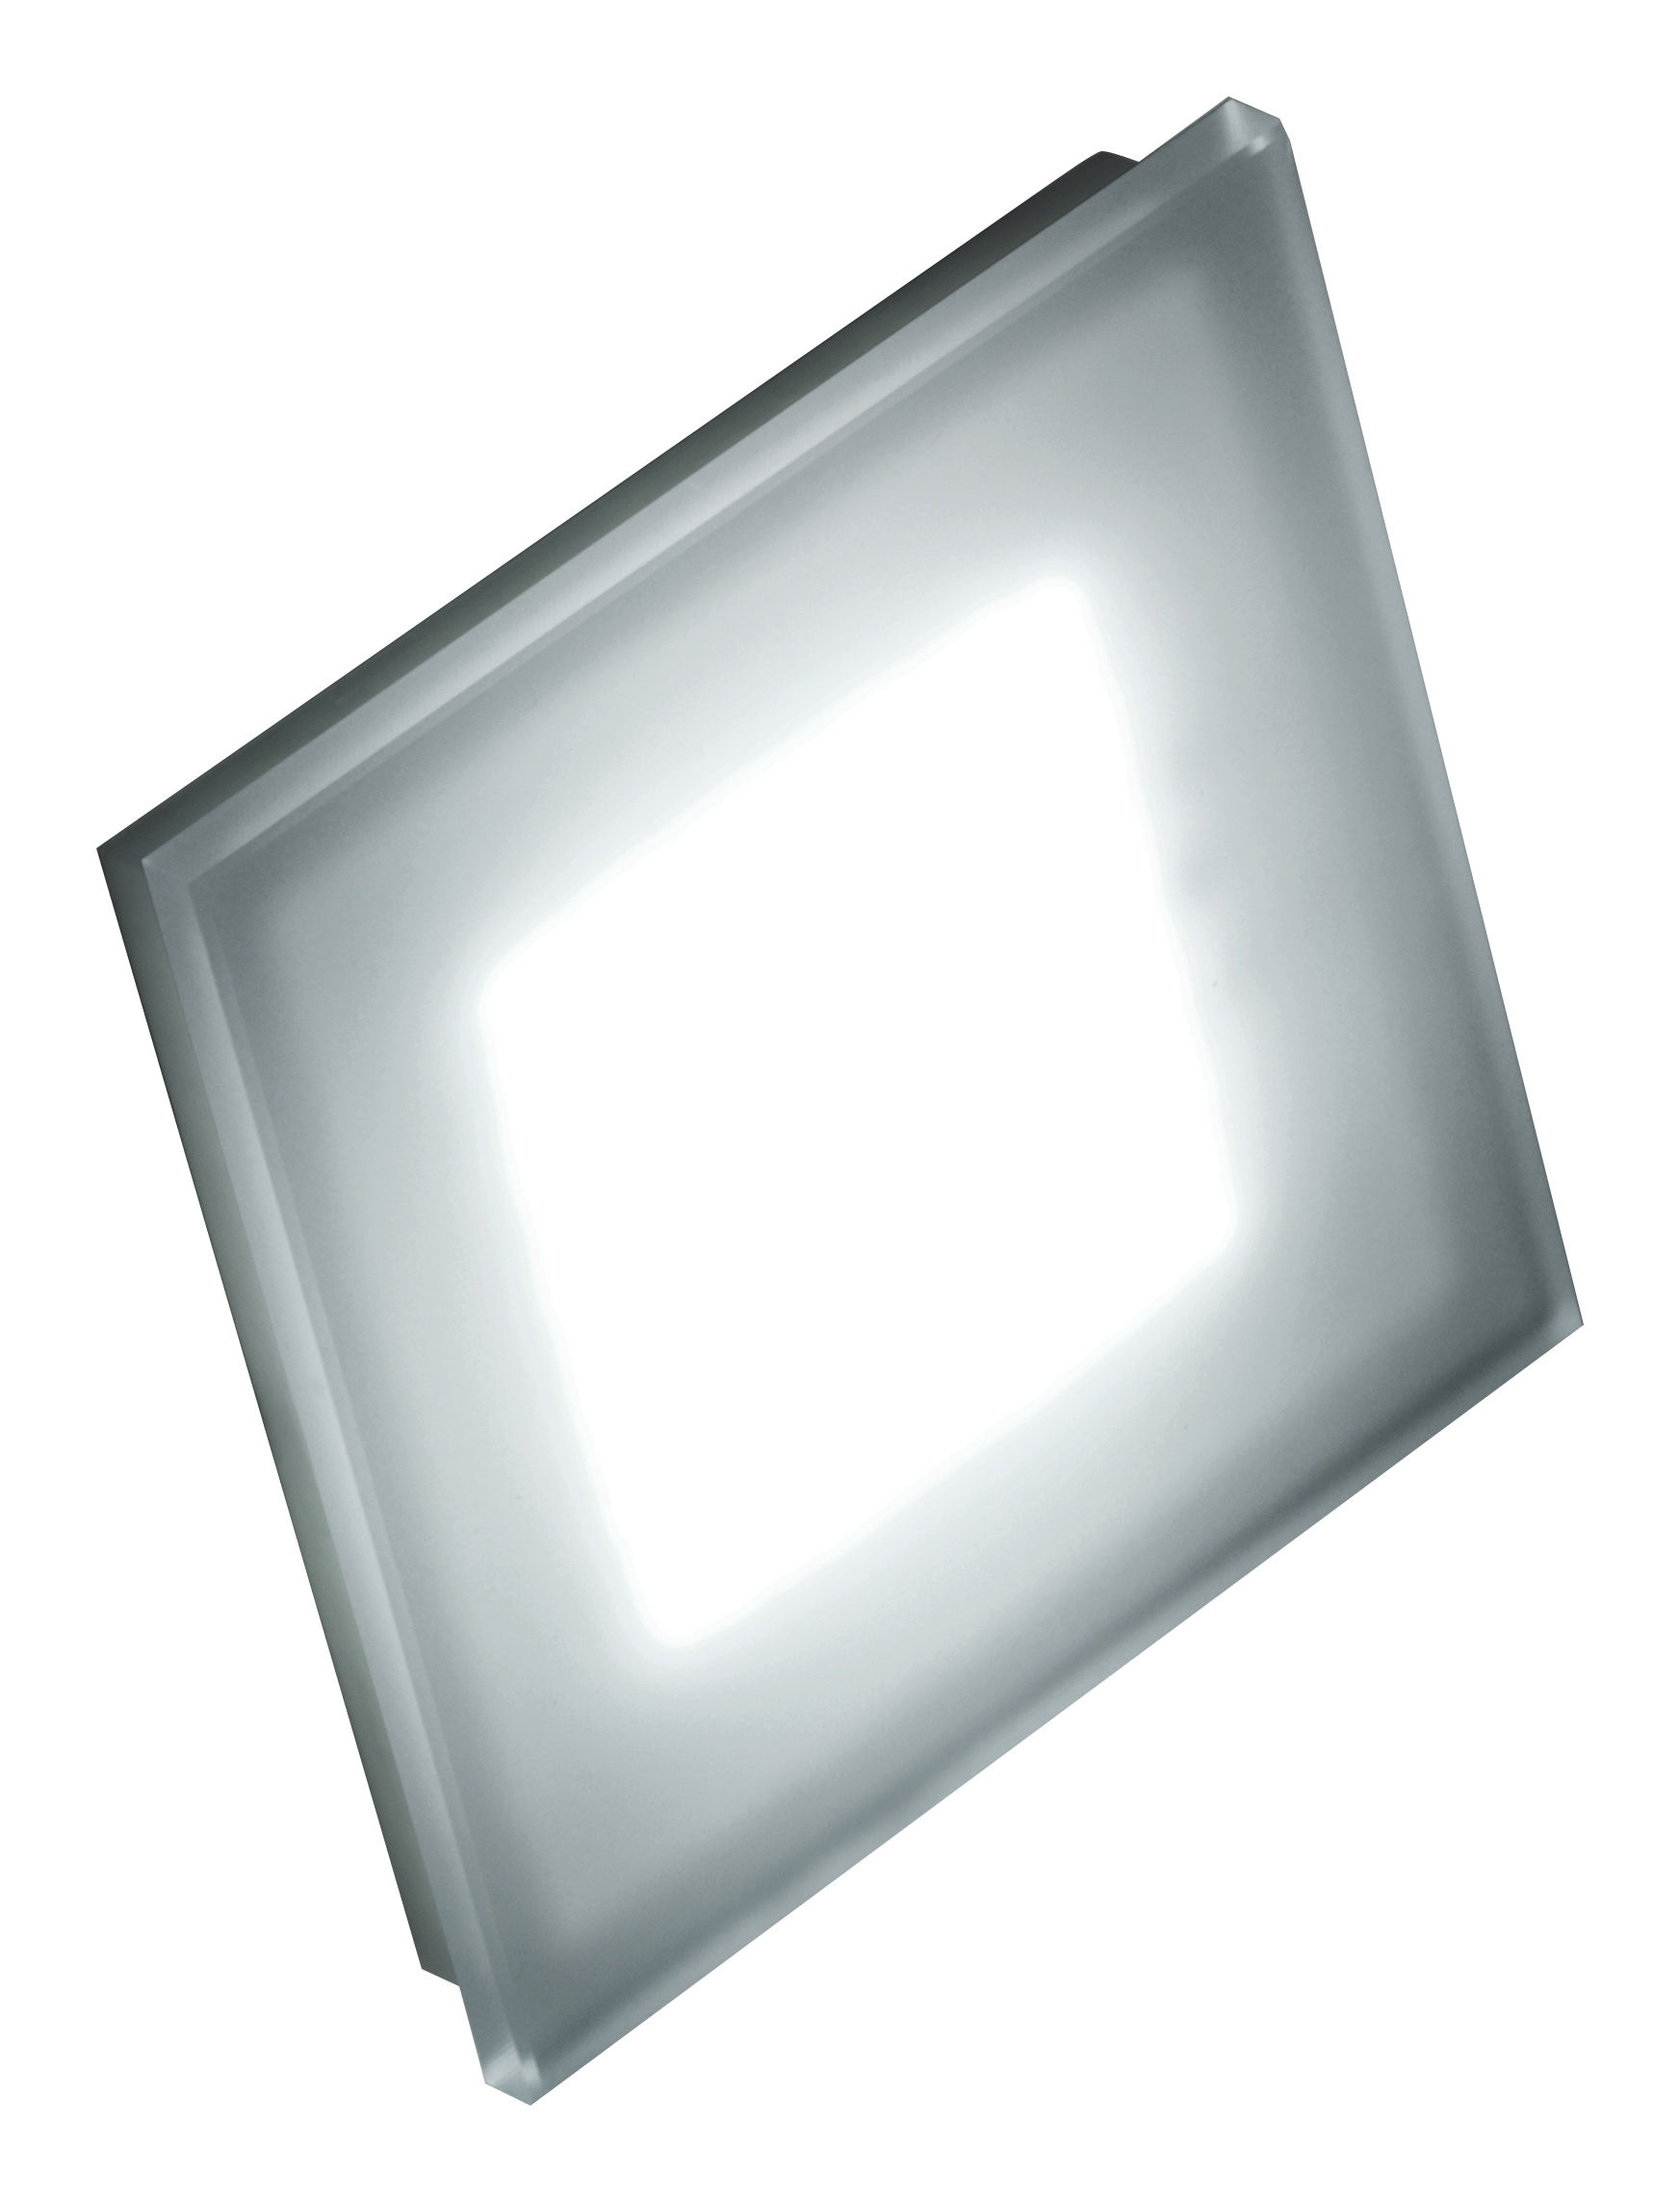 Lighting - Wall Lights - Sole Wall light - 144 Leds - Small 12 x 12 cm by Fontana Arte - White & screen-printed glass - Corian, Glass